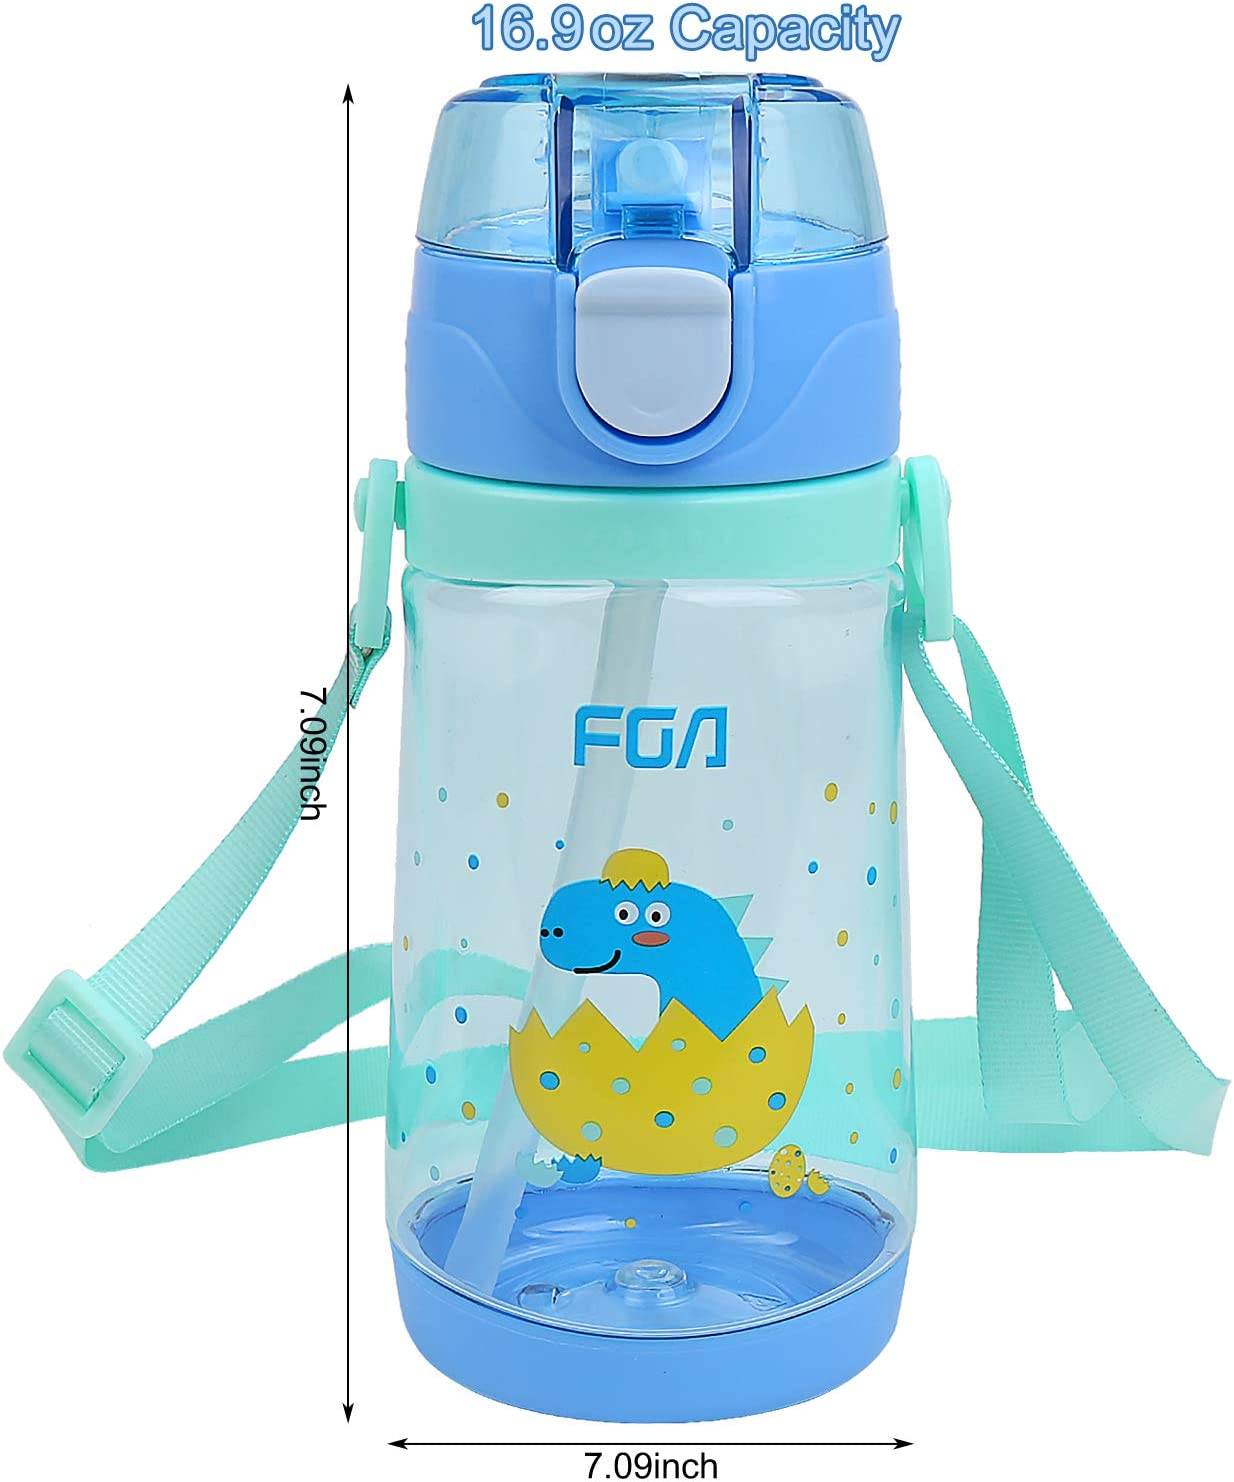 Ion8 Delgada Botella Agua Gatos Astronautas 600ml Sin Fugas